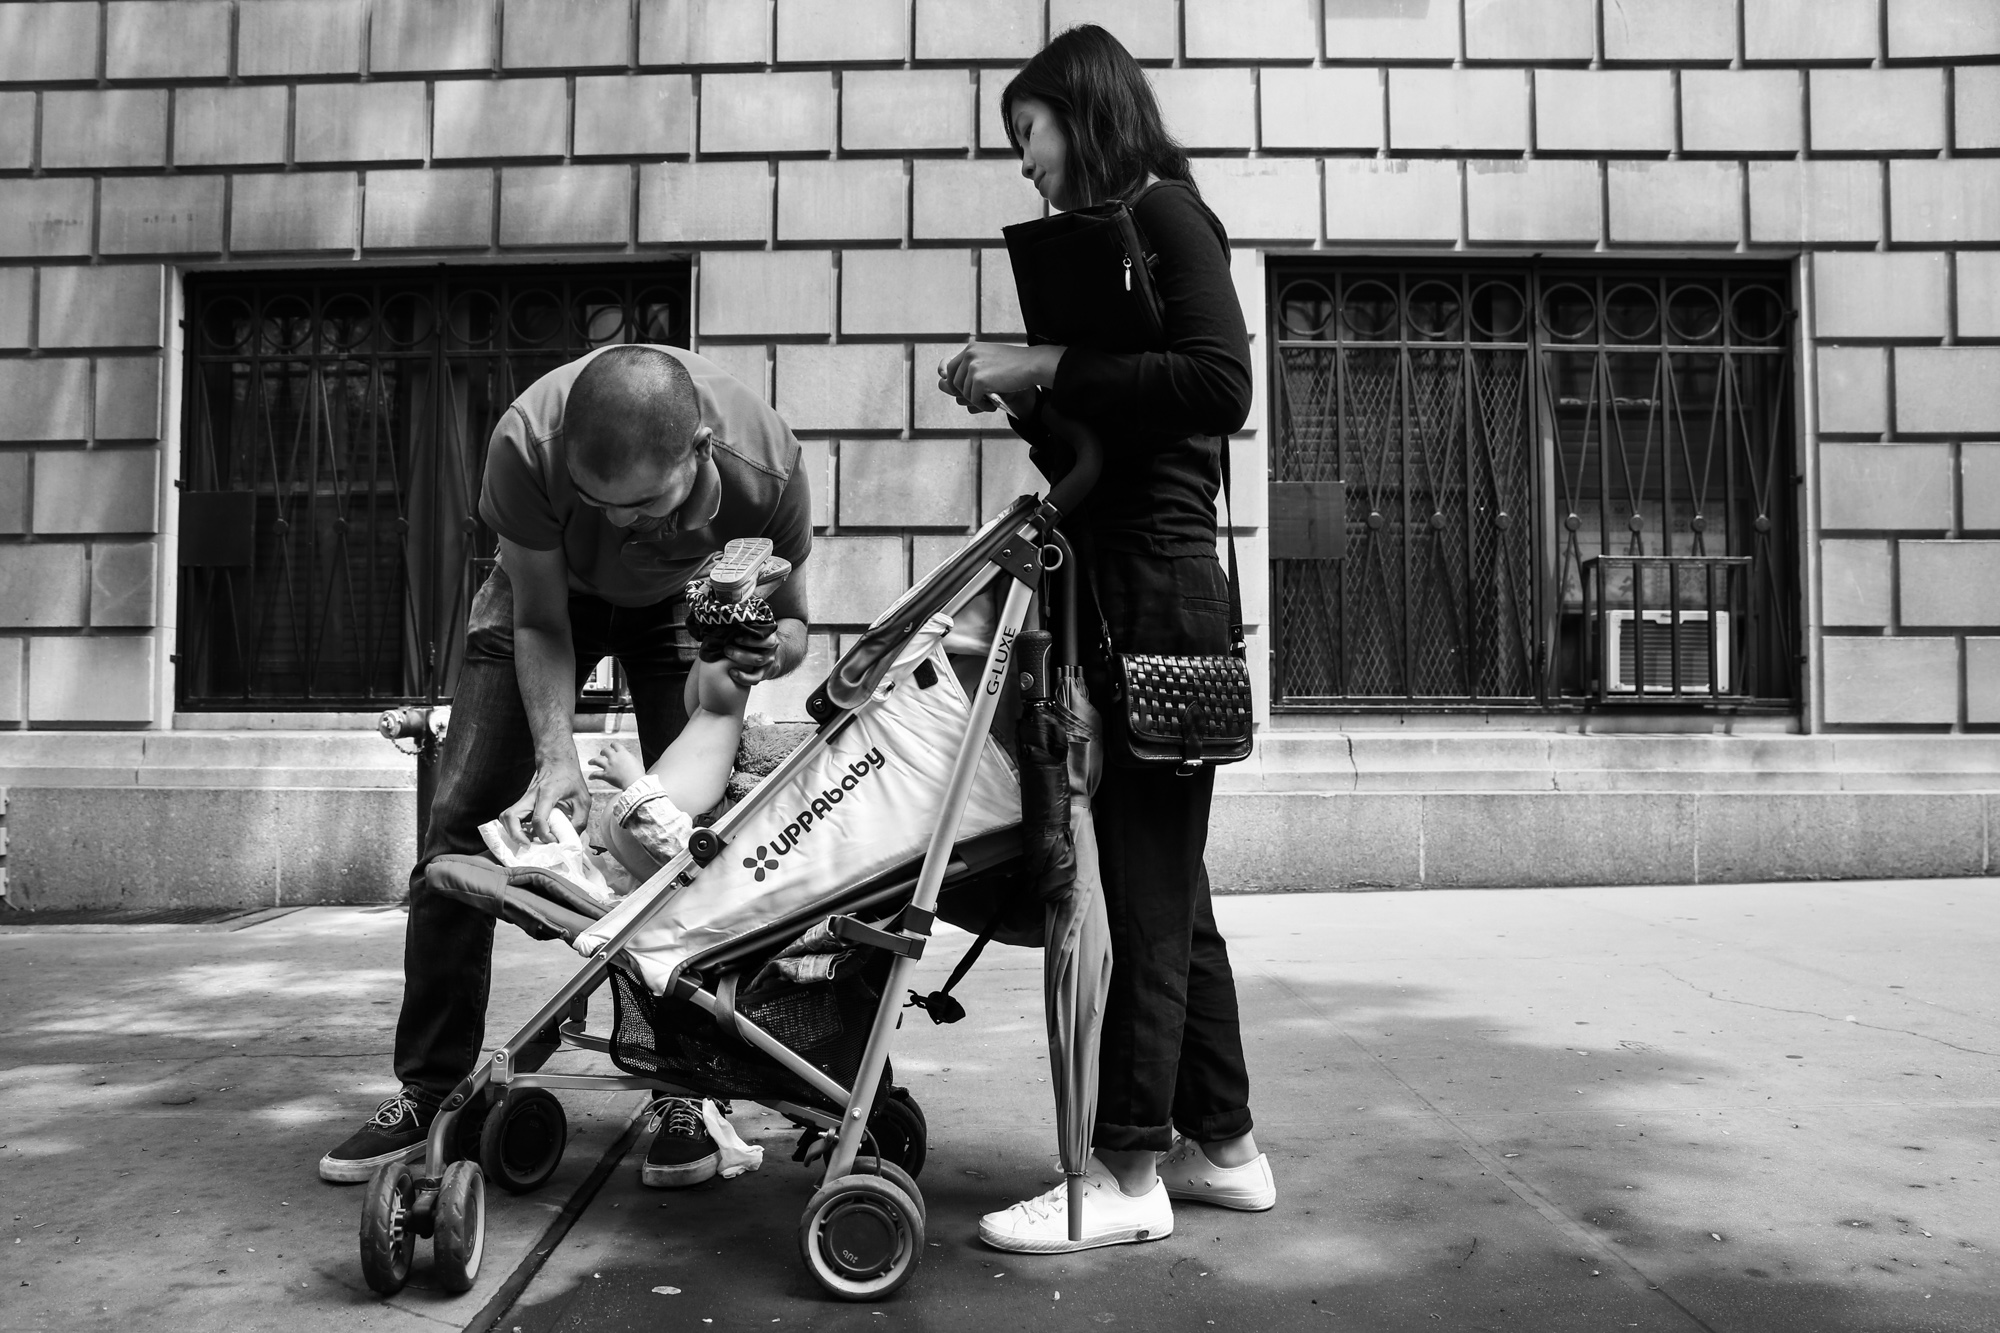 Man changes diaper on the sidewalk in a stroller